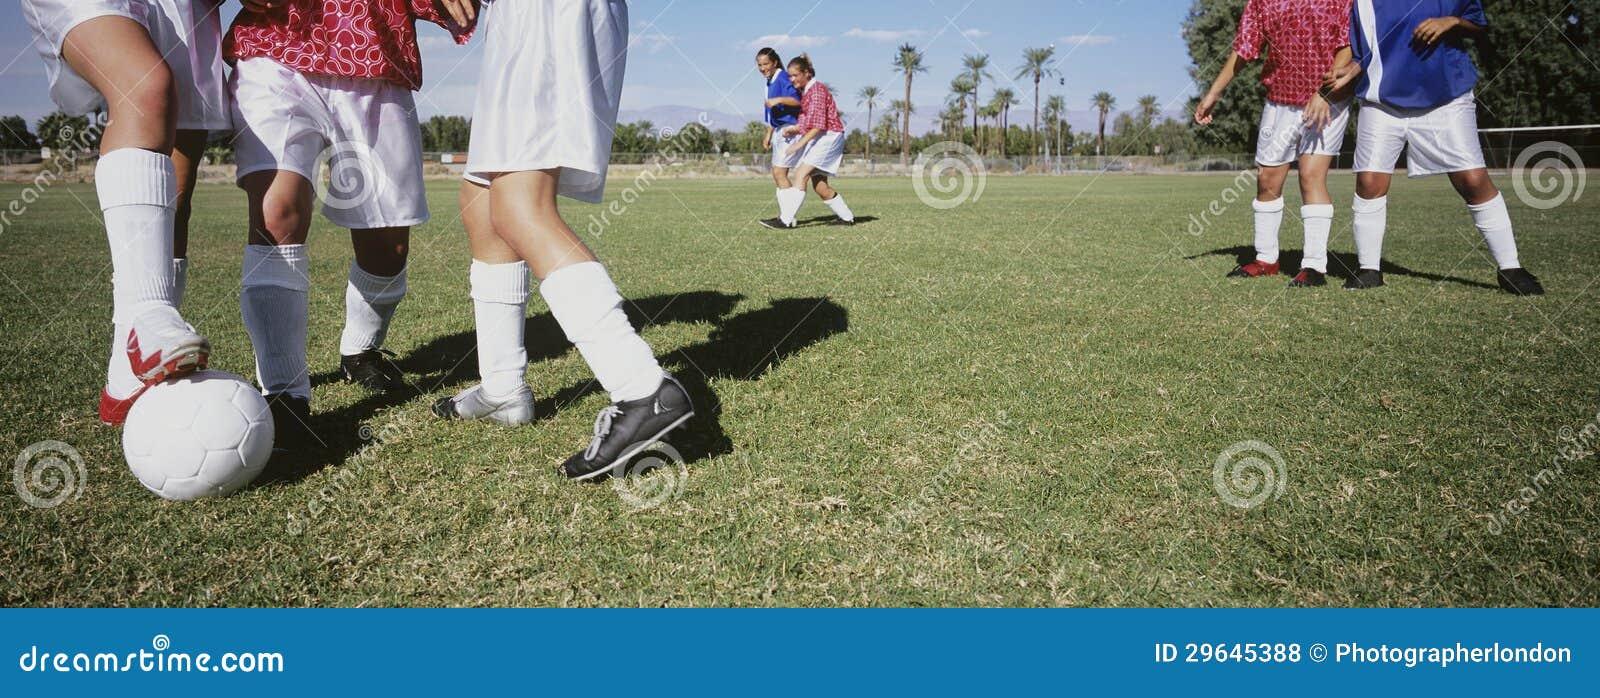 Footballeurs abordant le football